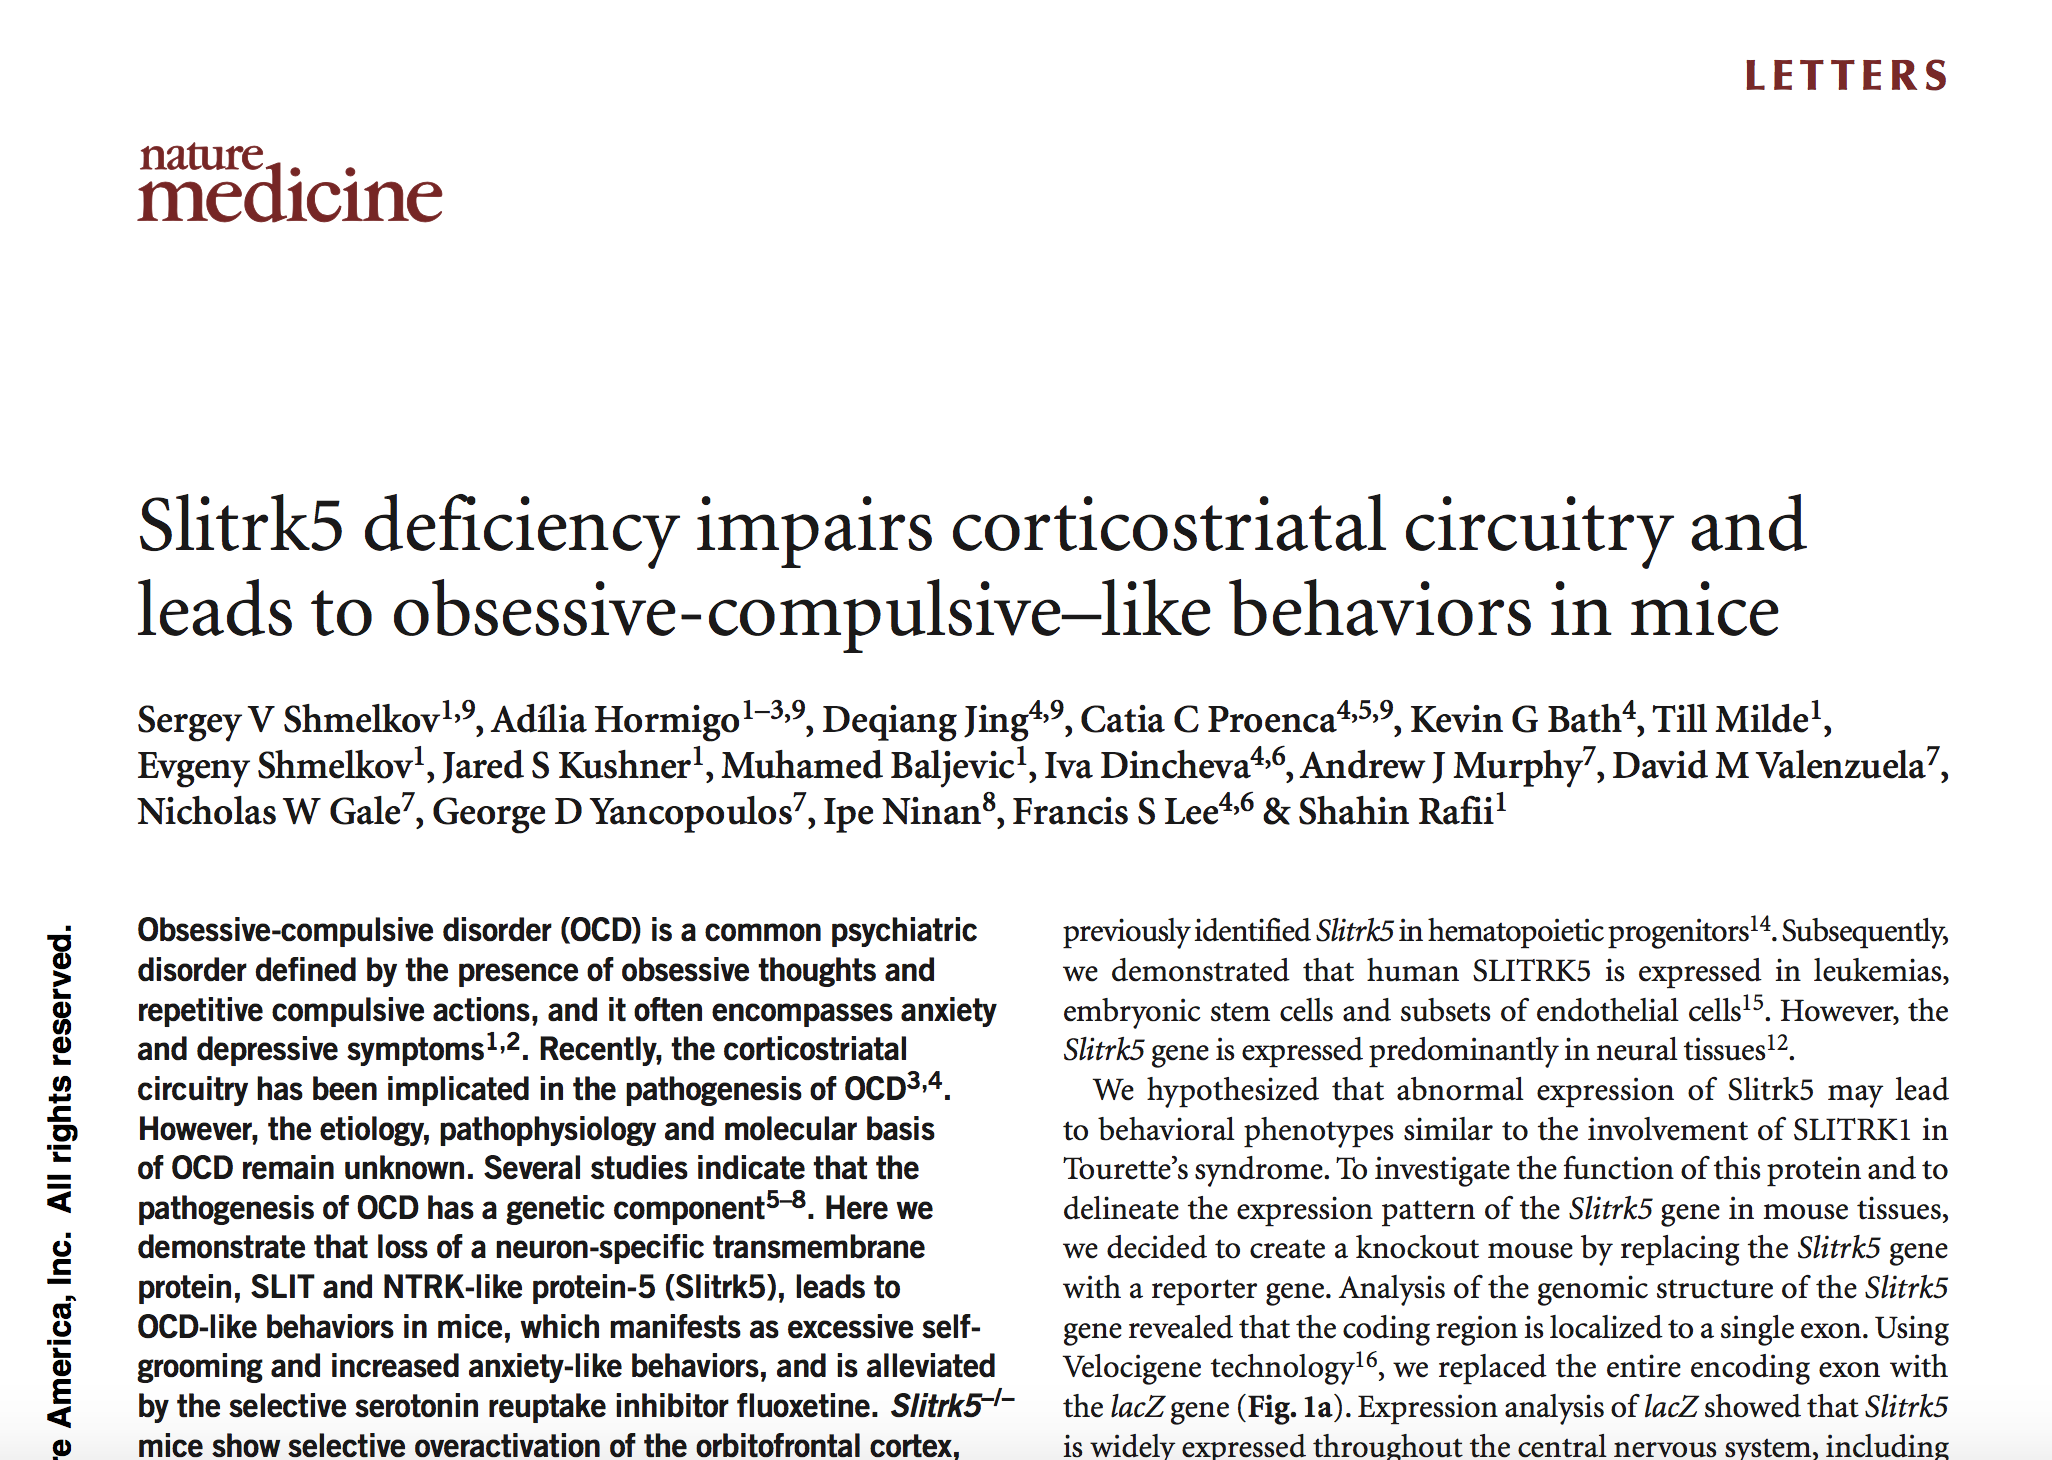 Shmelkov et al., 2010.     Nature Medicine.